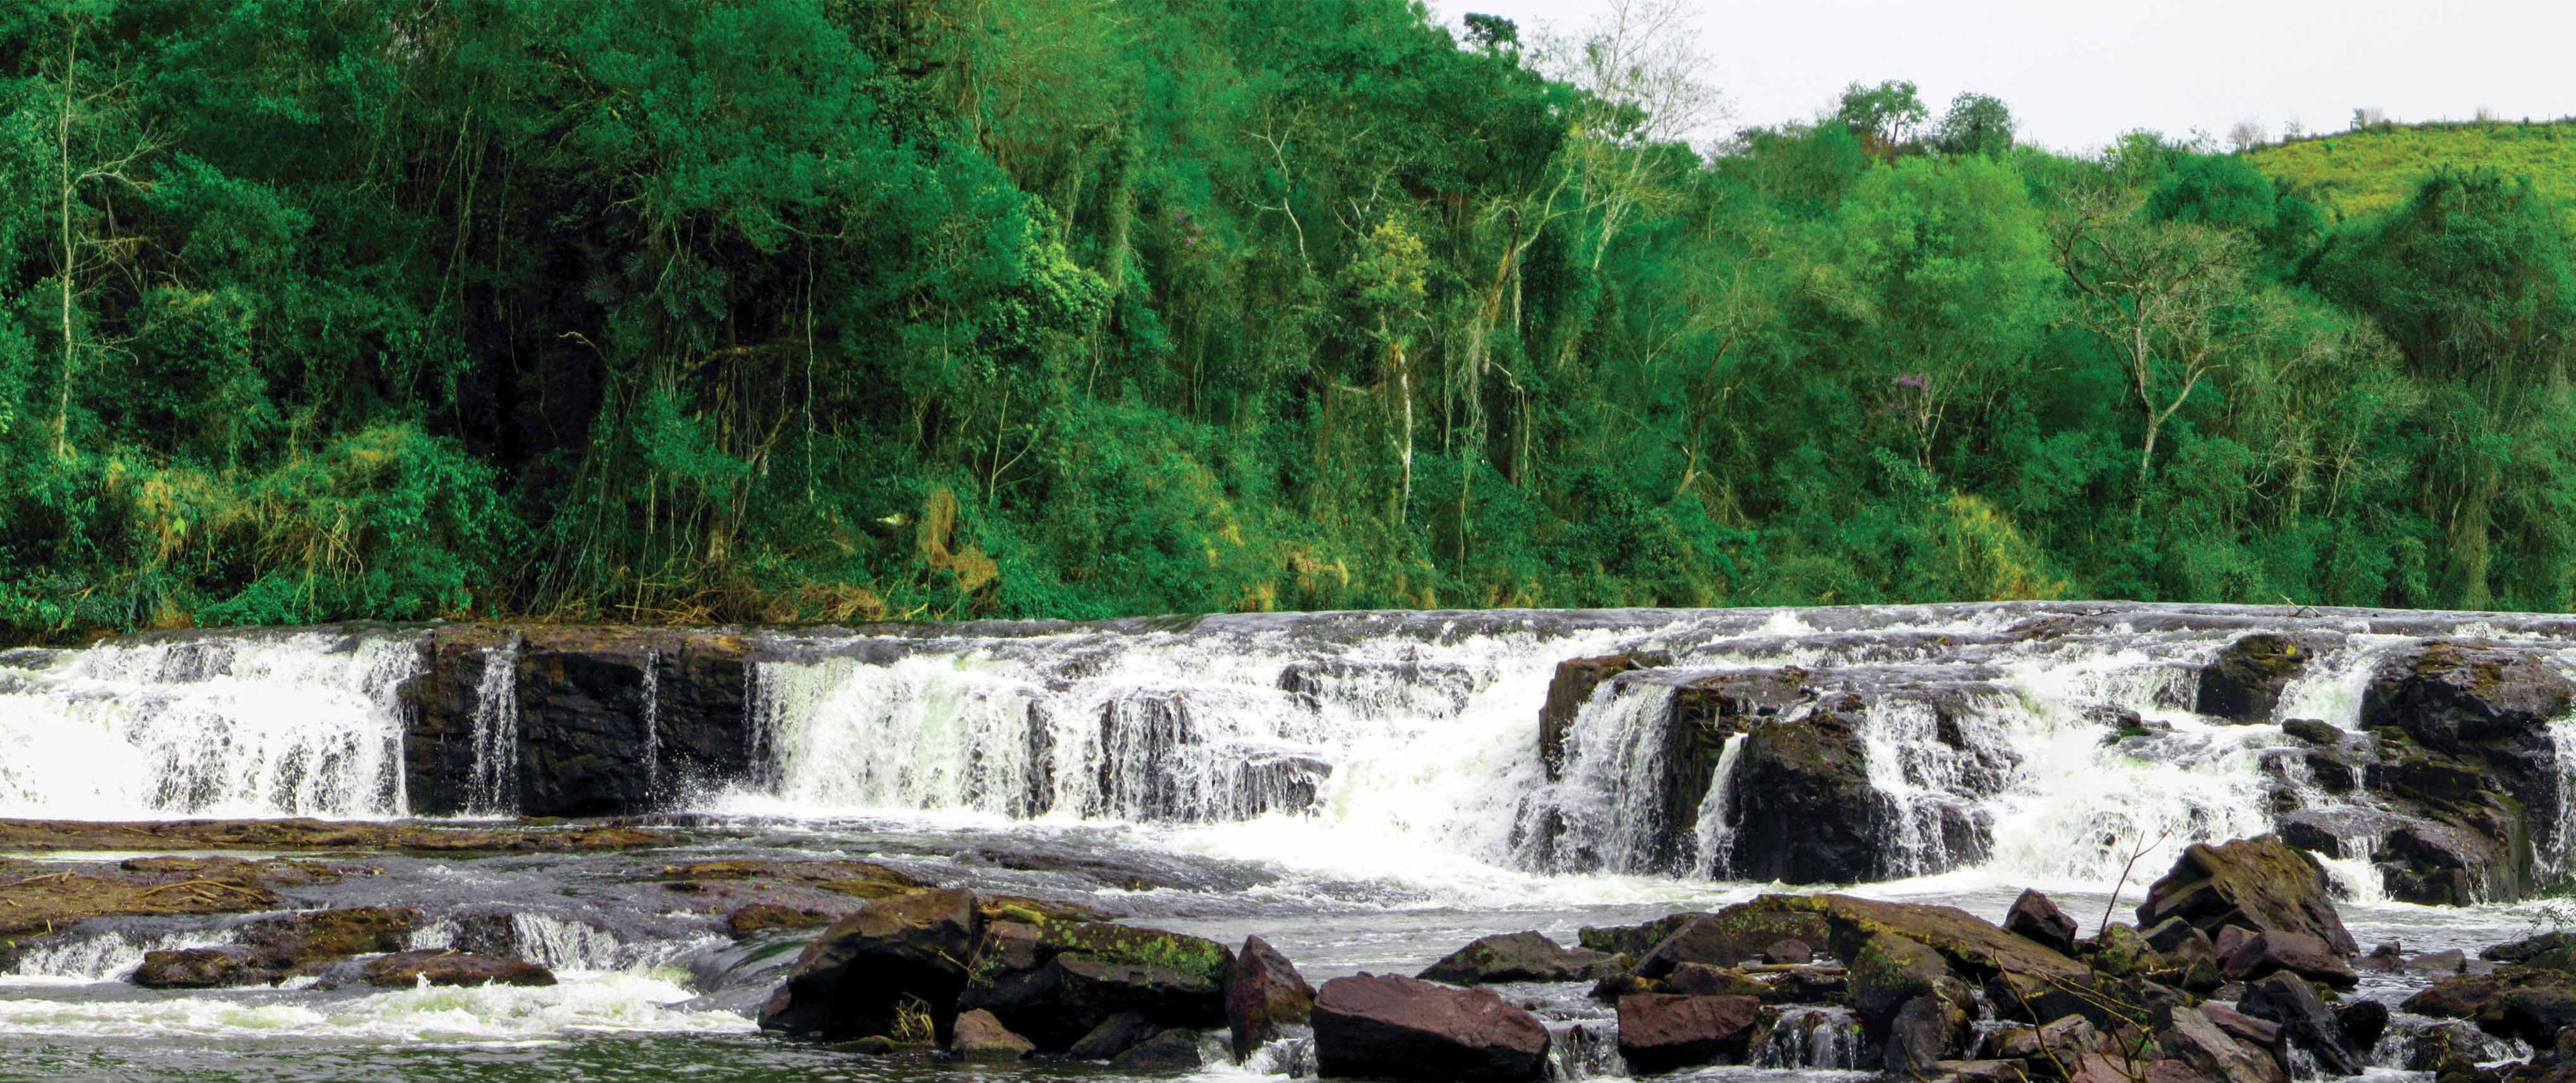 Salto Rio Bom